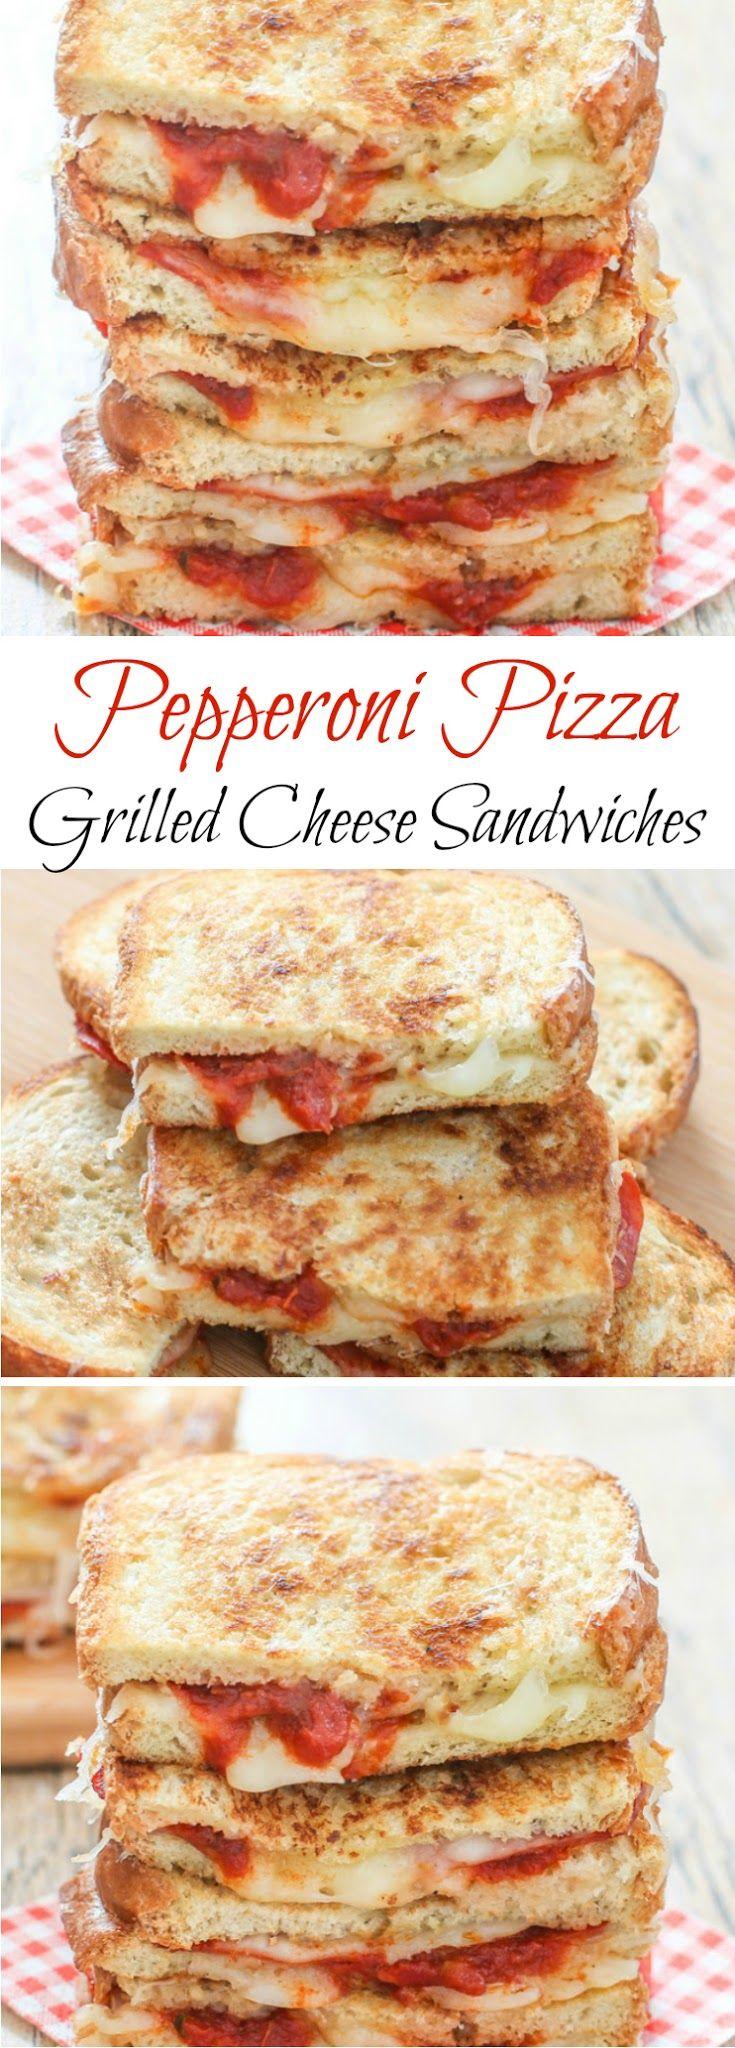 Pizza Grilled Cheese Sandwich #sandwichrecipes